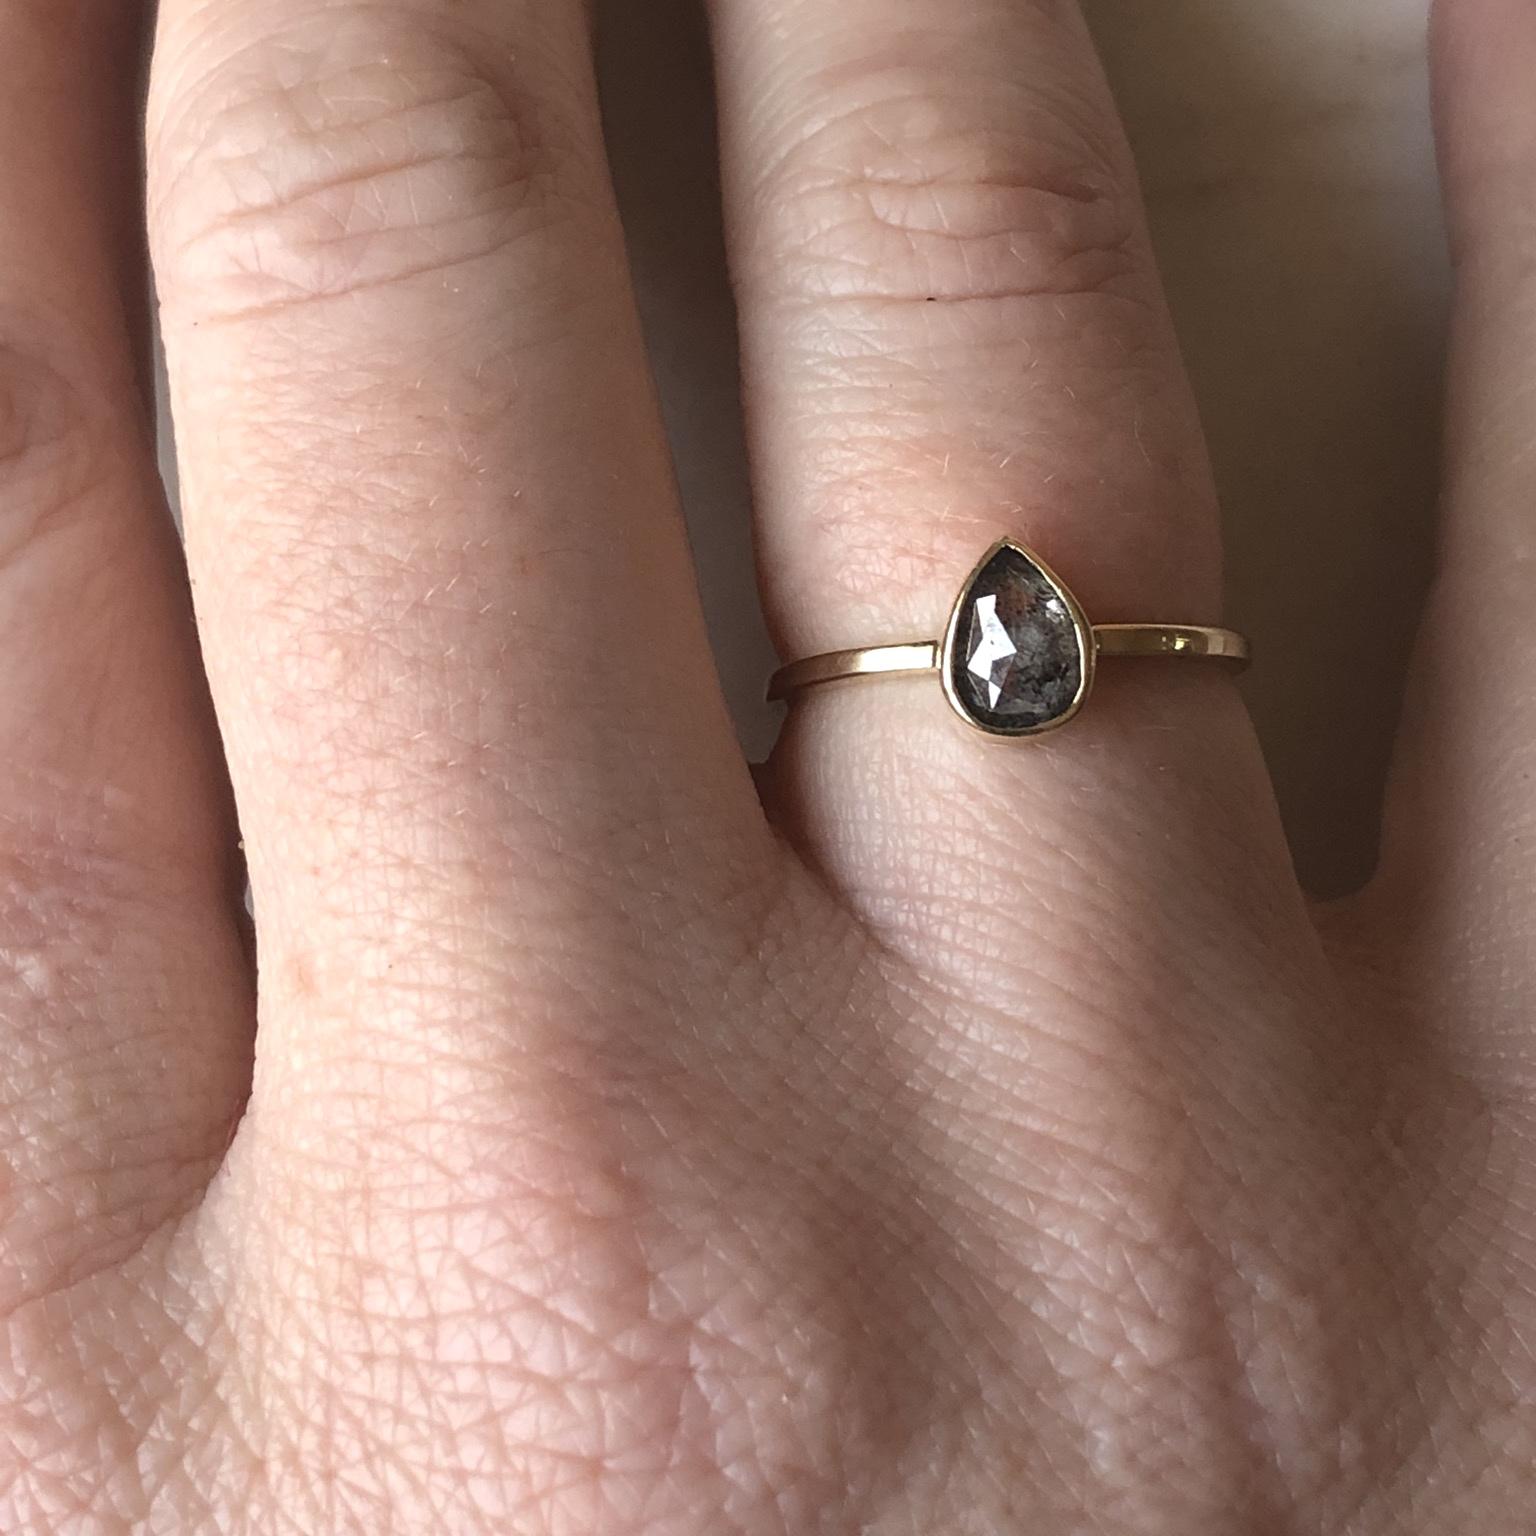 - pear shaped .75 ct salt & pepper diamond14k yellow gold size 7 - sizing optional$1200.00